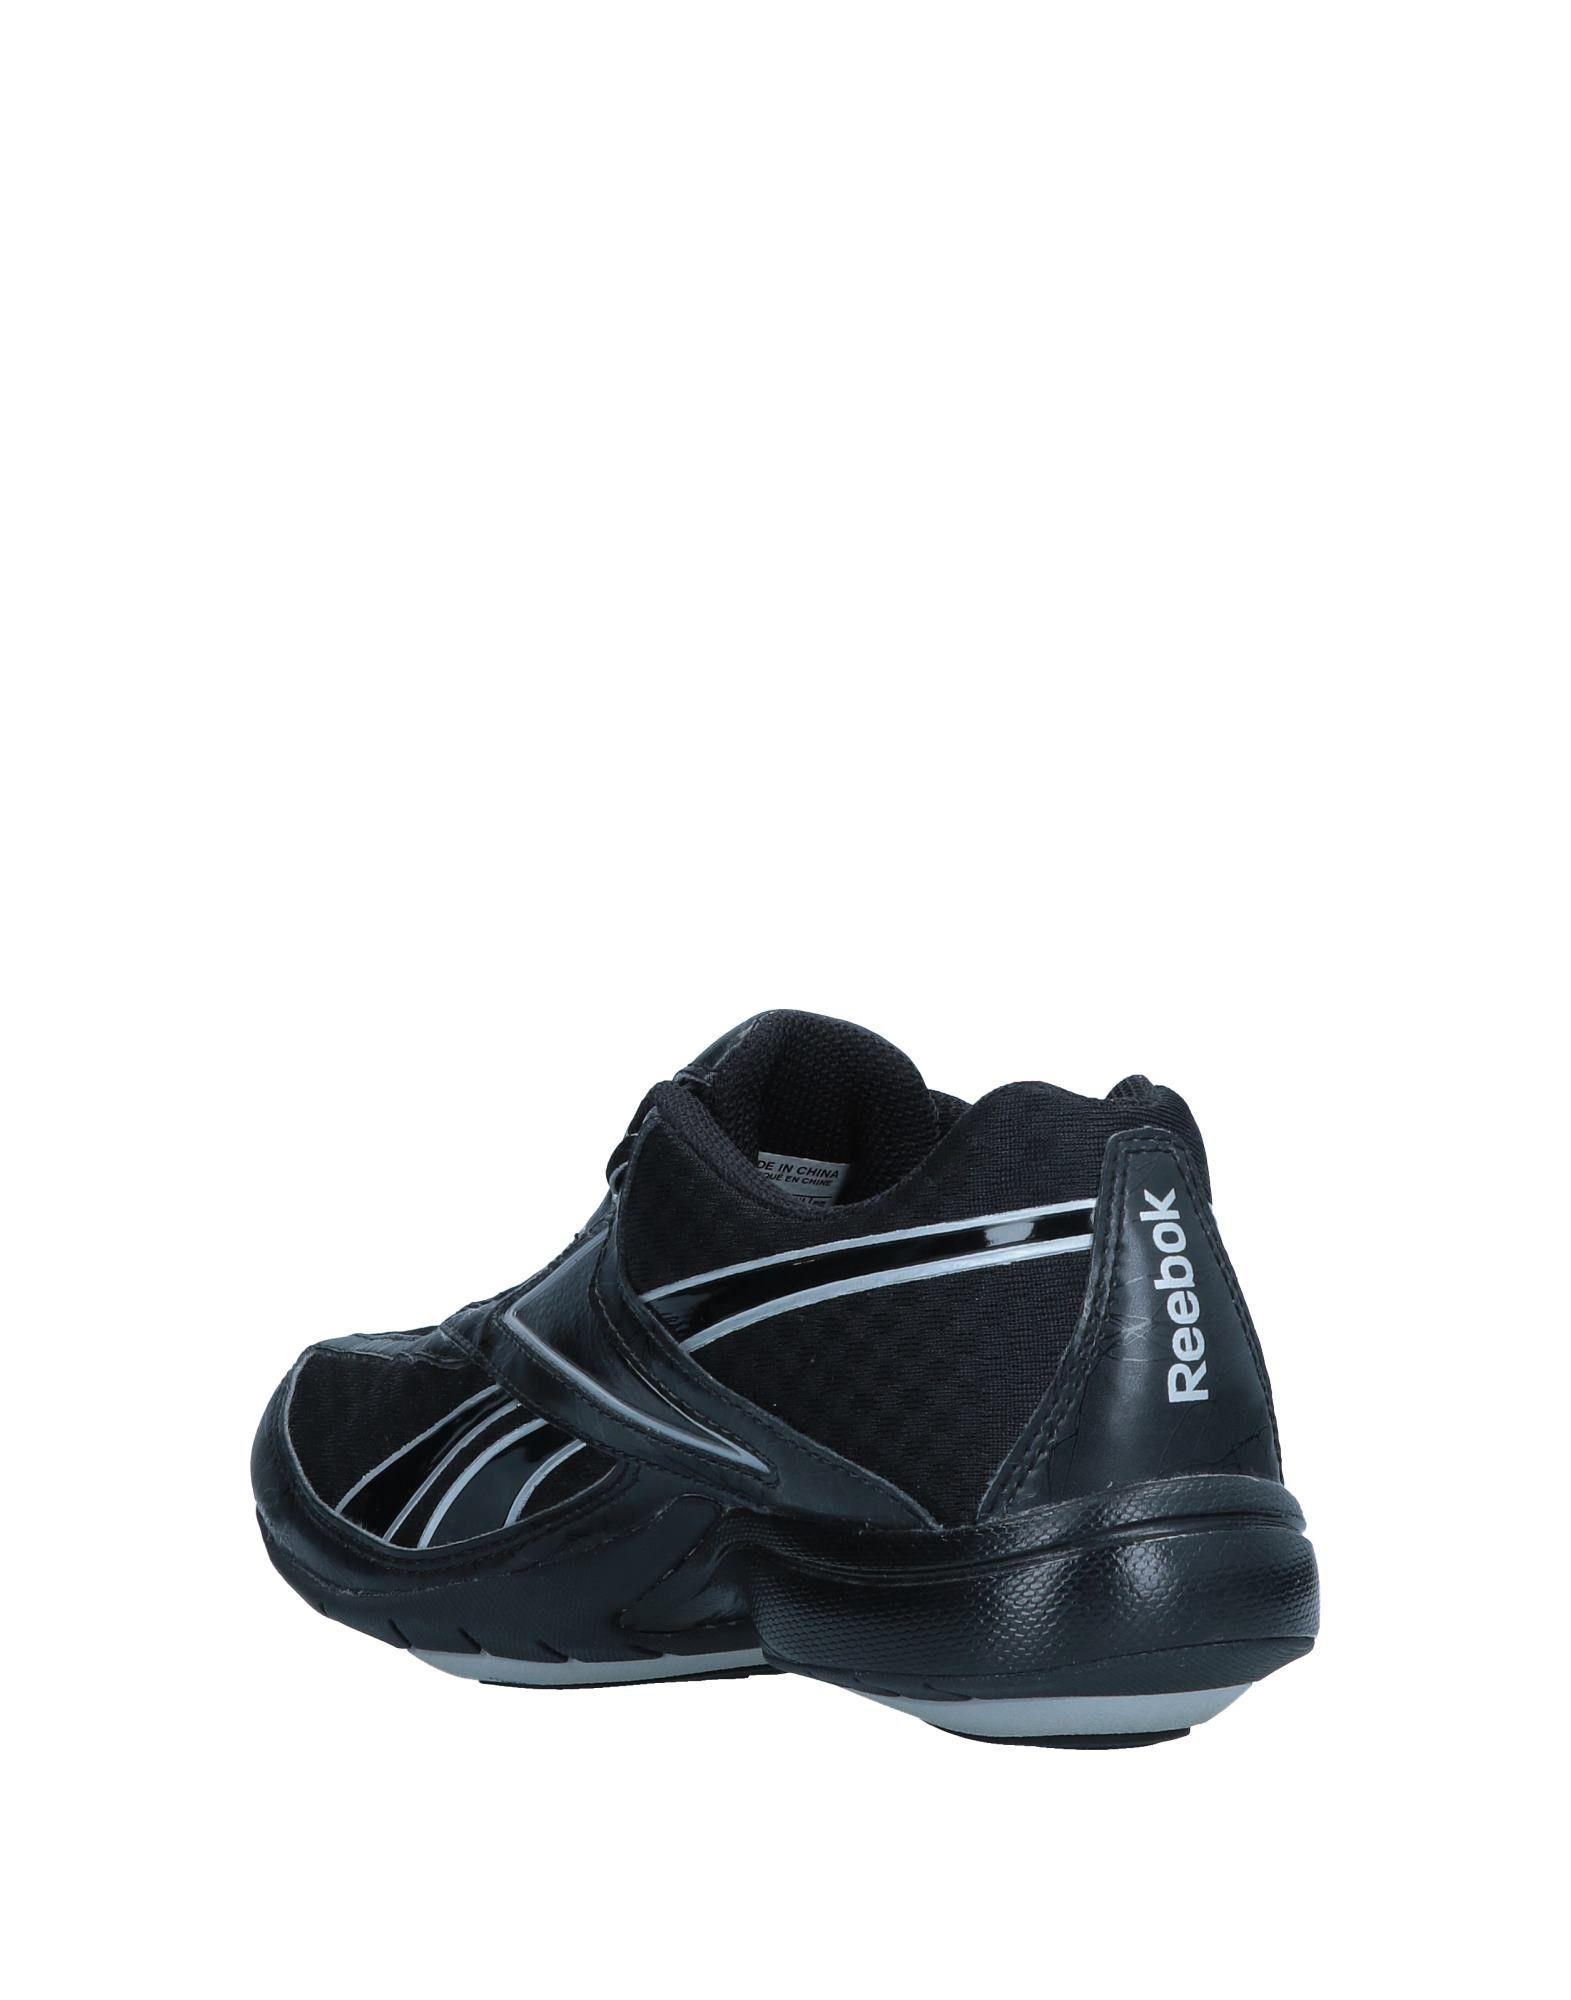 Reebok Sneakers Damen  11546108GG 11546108GG   6f317f